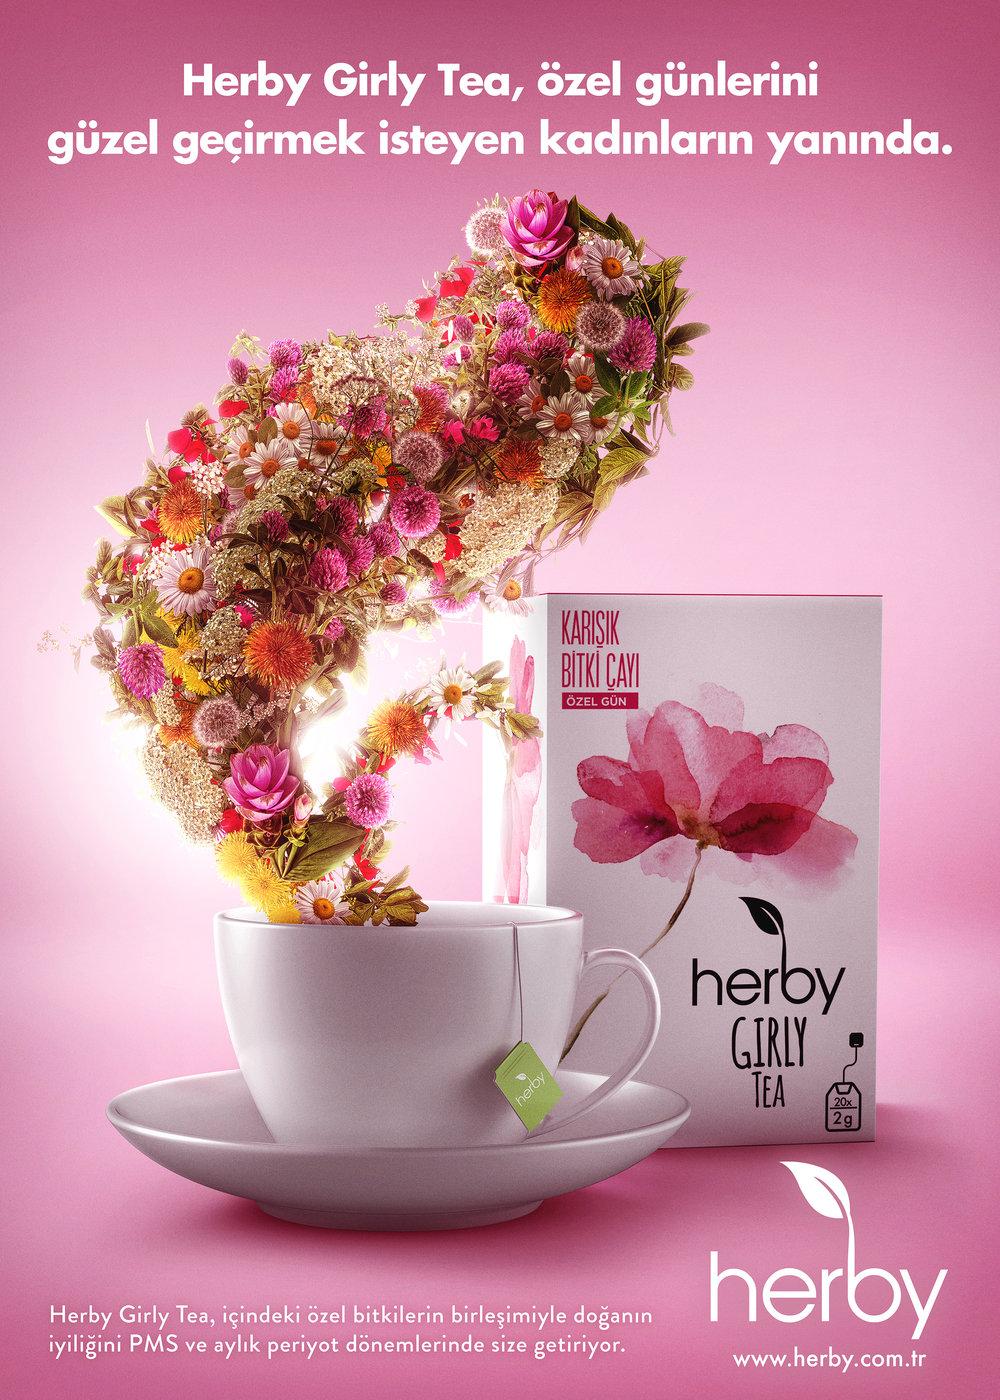 HERBY GIRLY KV - 3.jpg